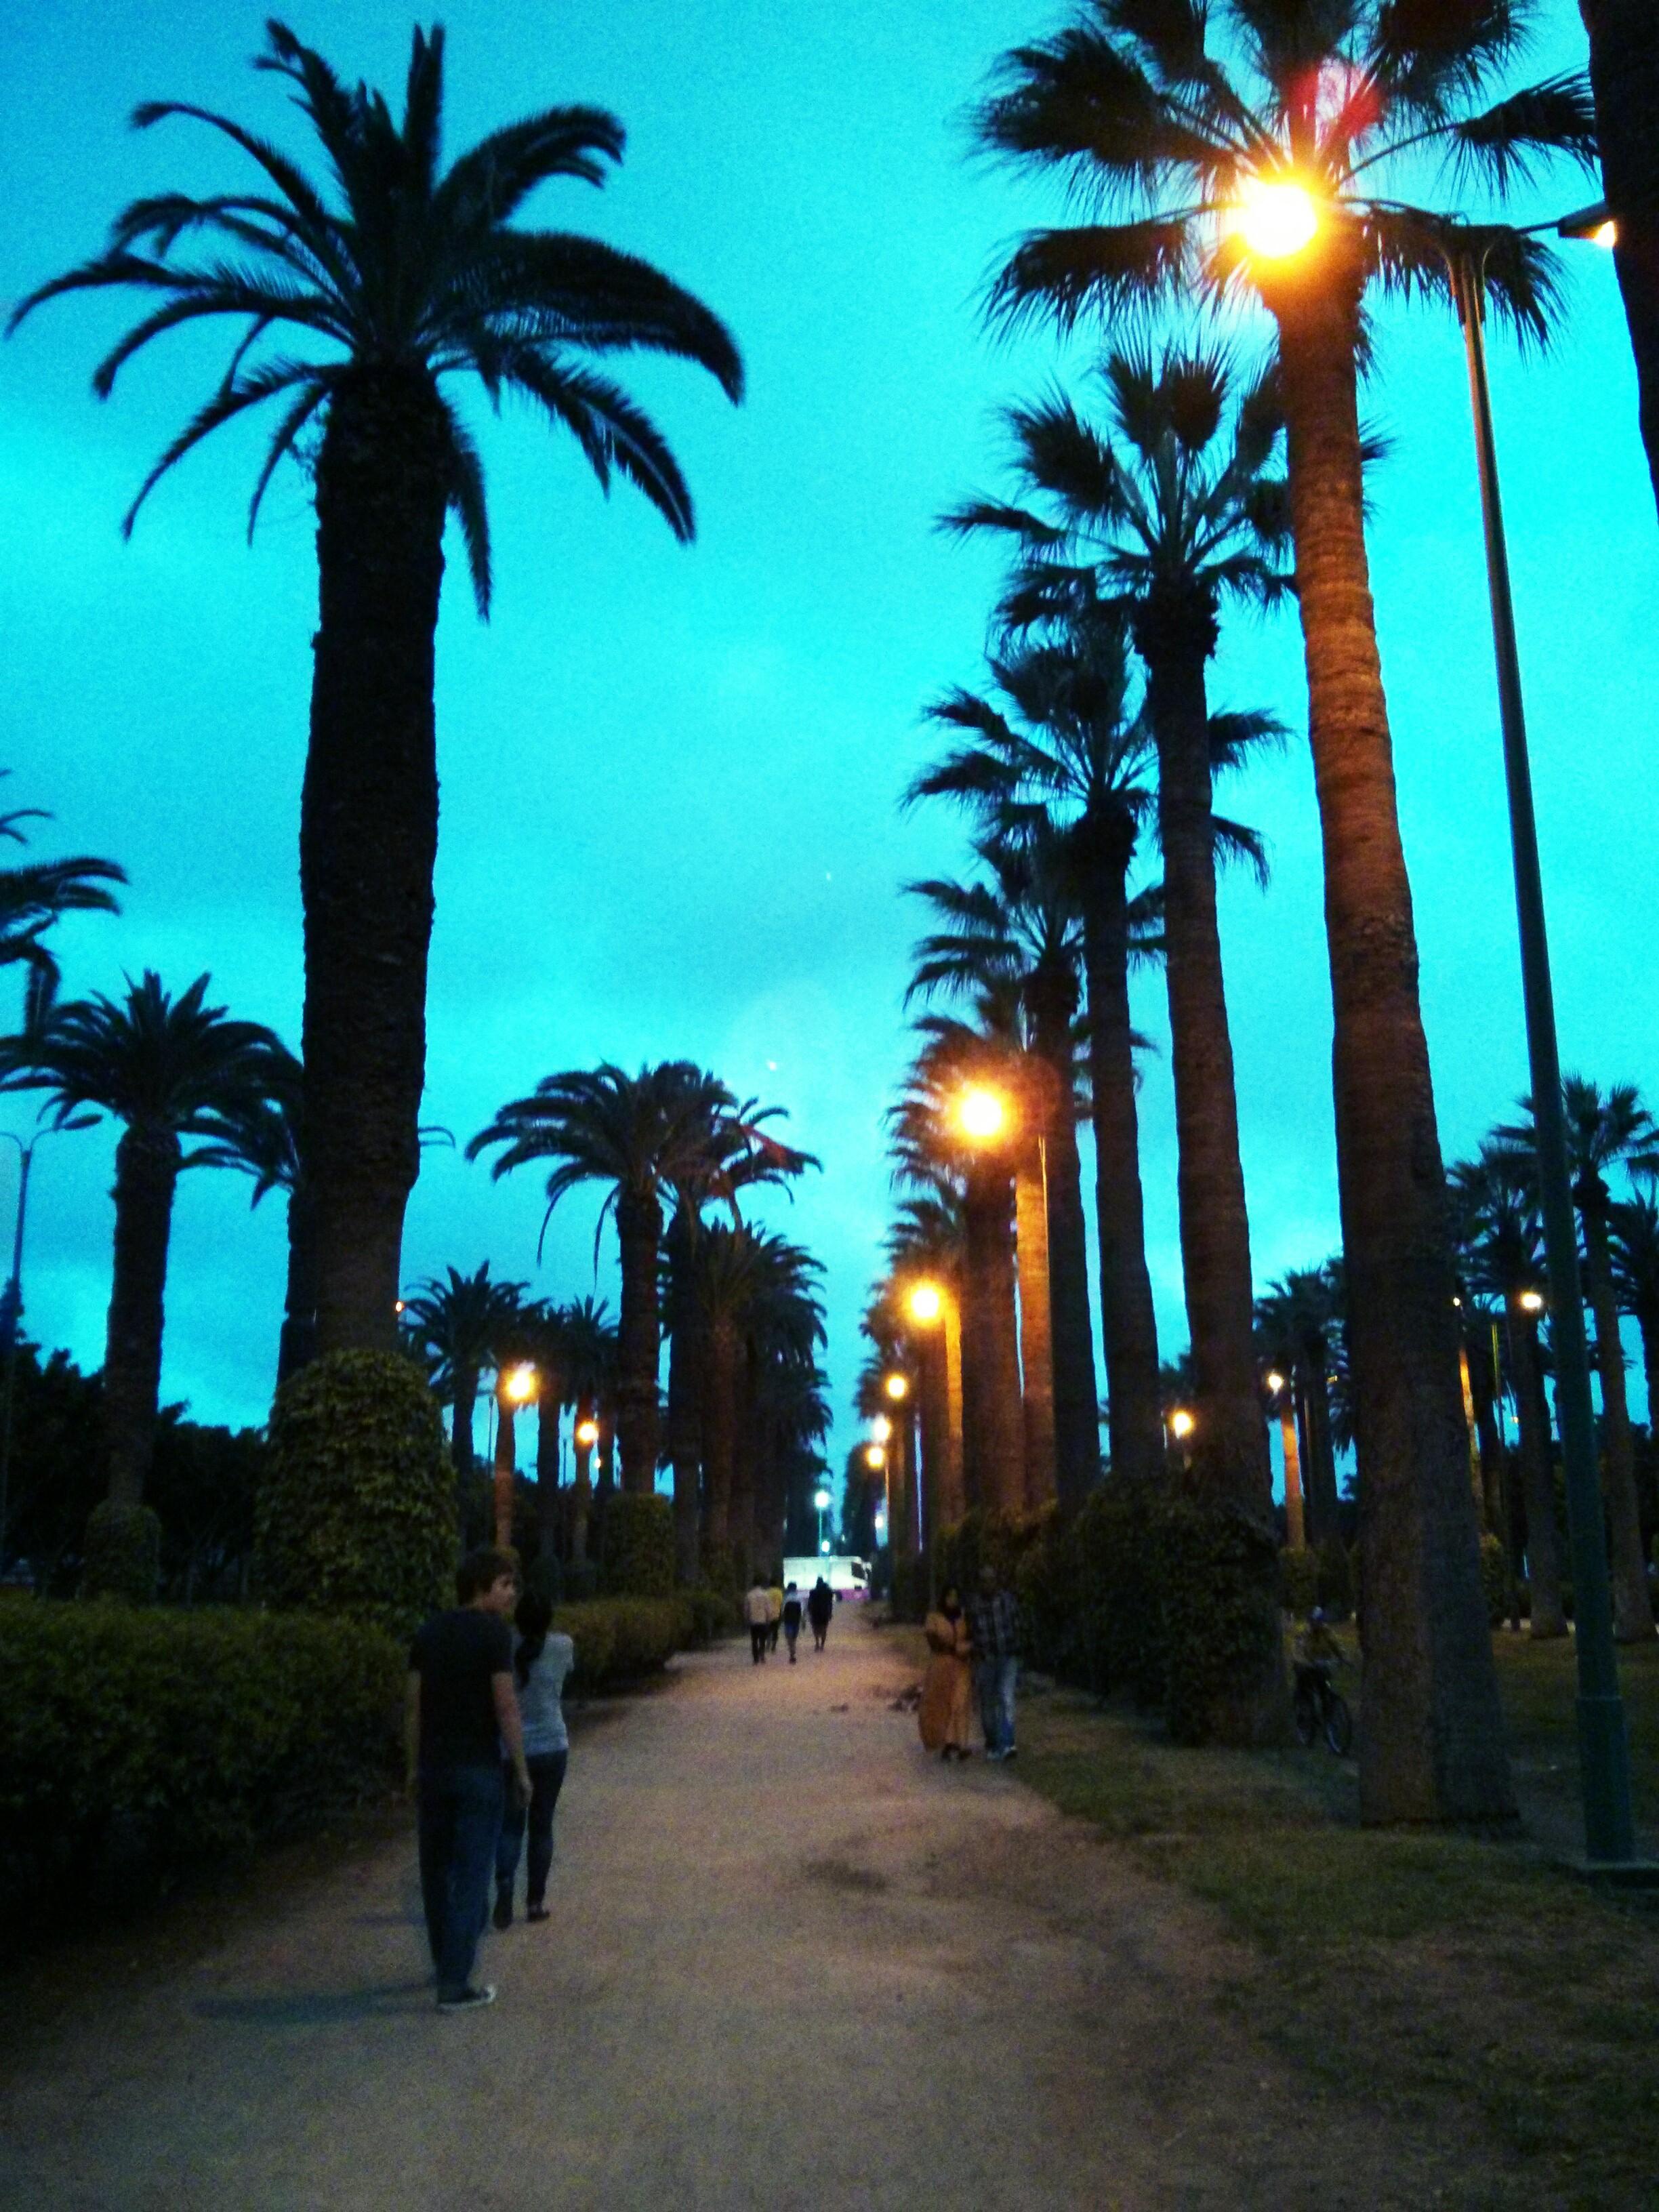 Casablancan park at dusk